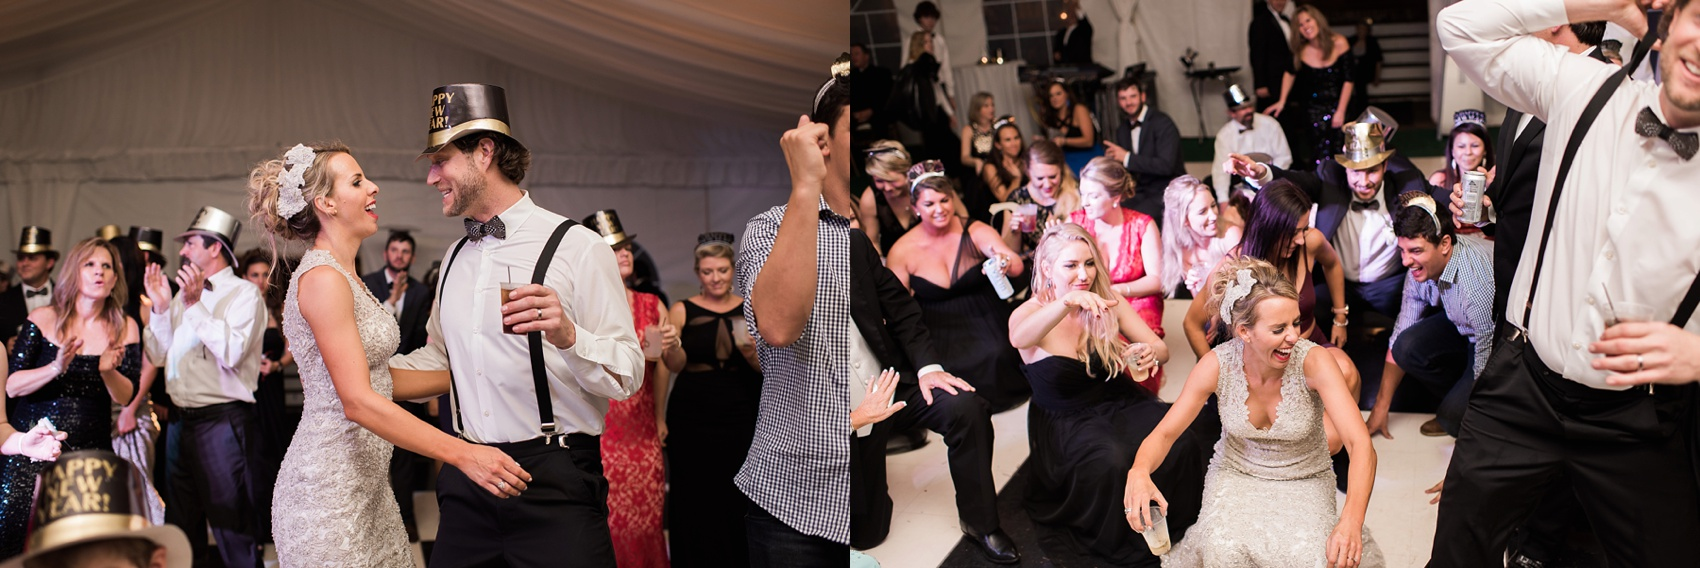 South_carolina_wedding_photographer_0141.jpg